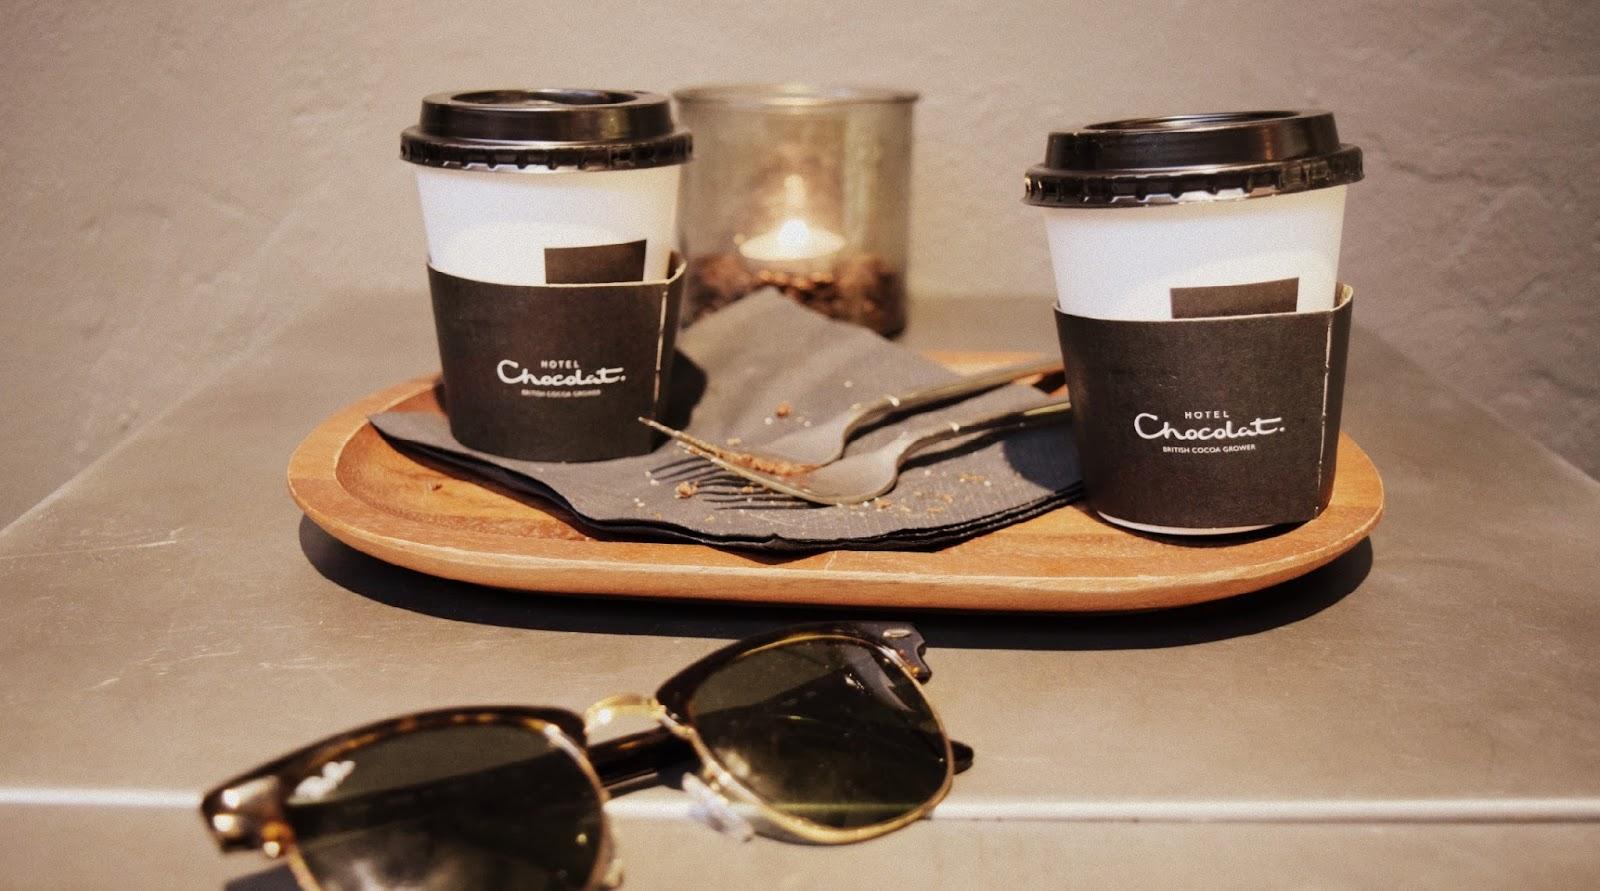 Hotel Chocolat latte Copenhagen